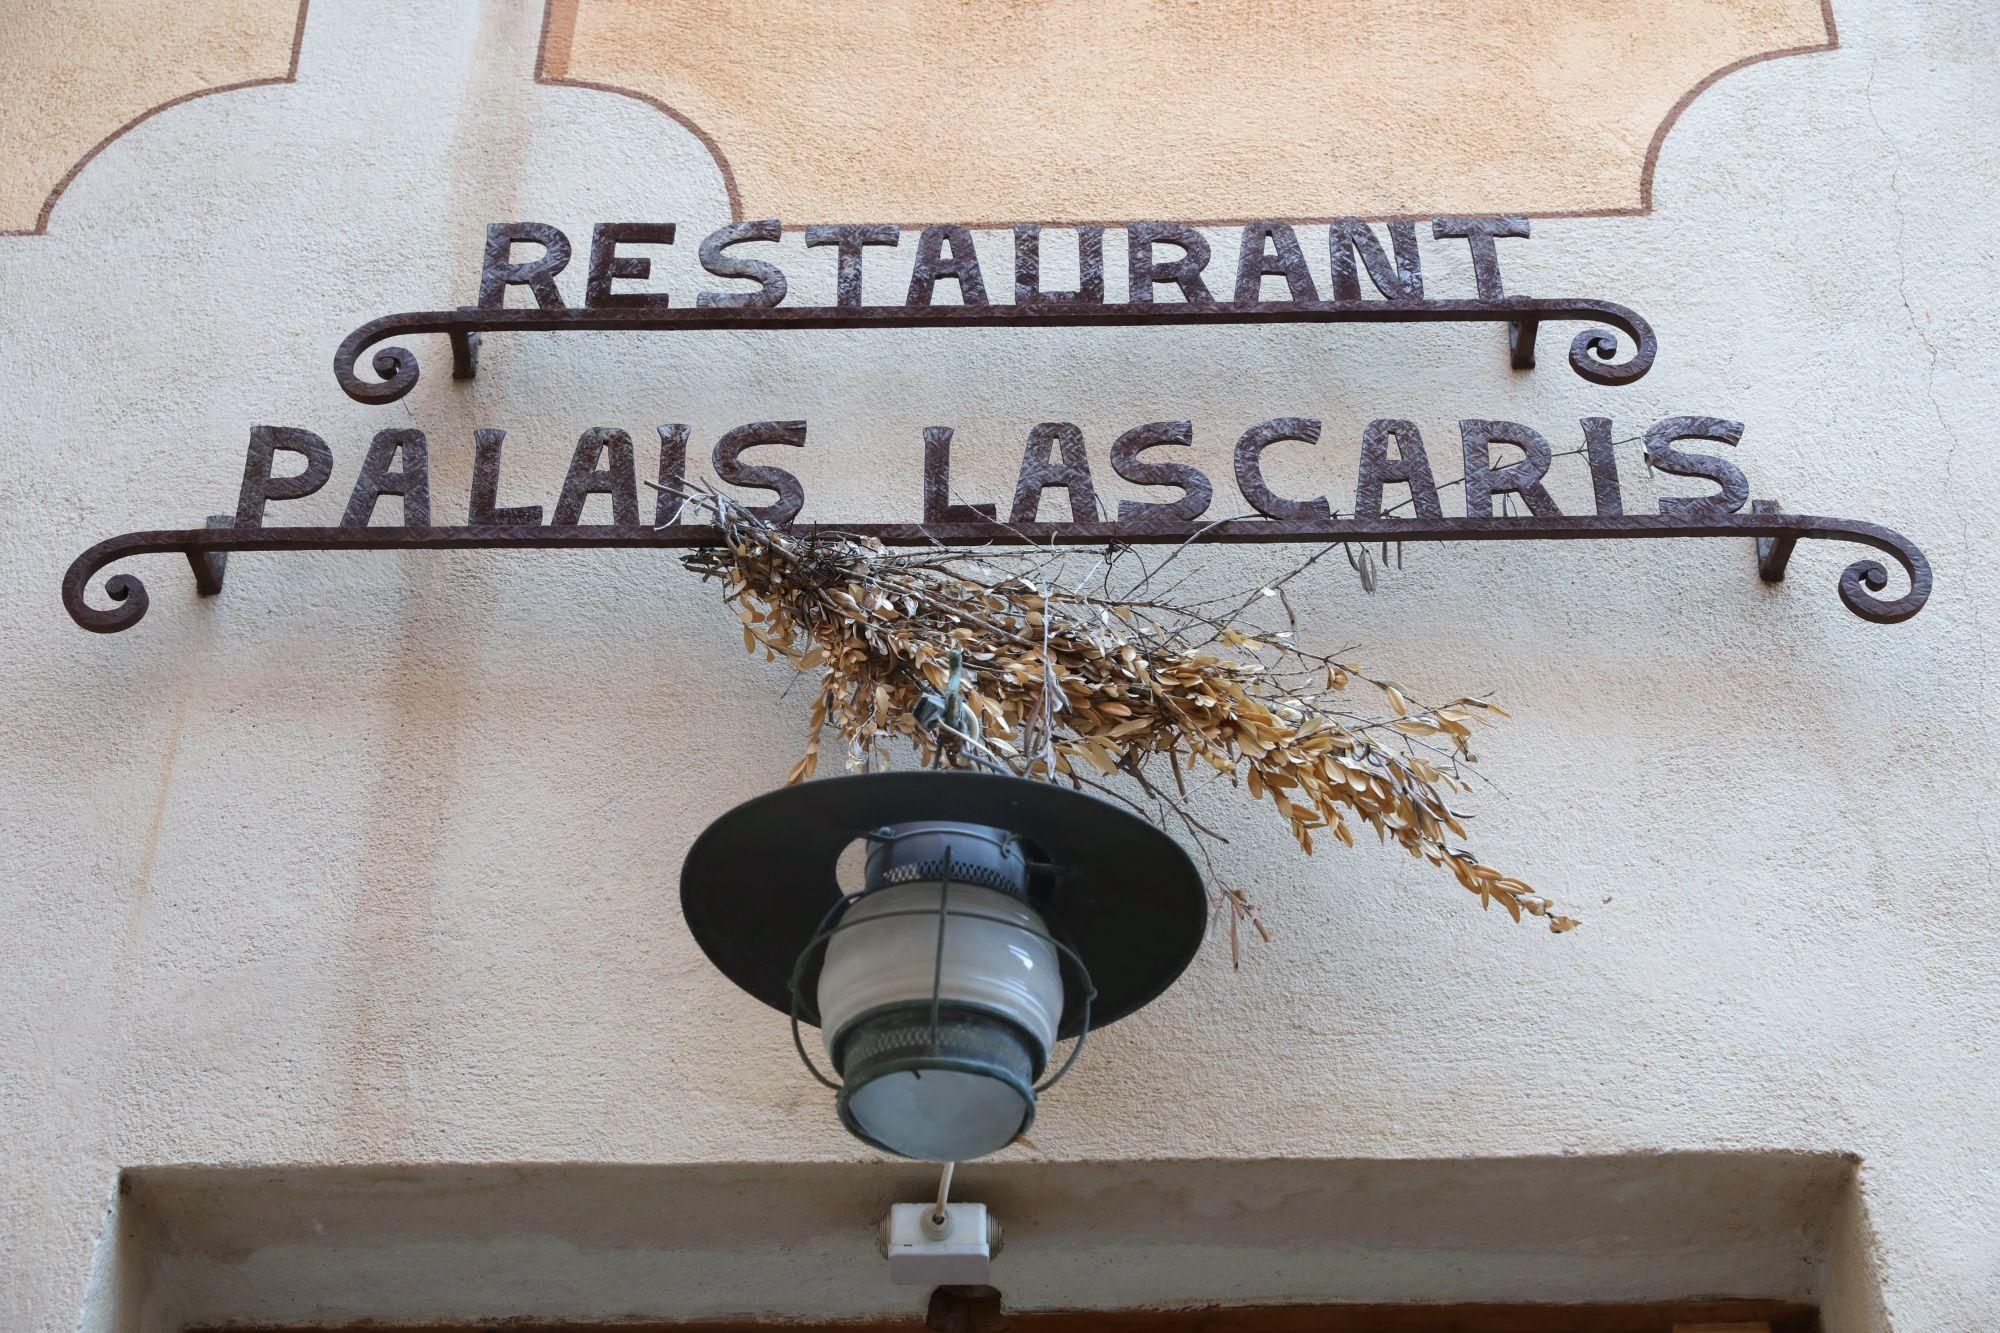 palais-lascaris-castellar